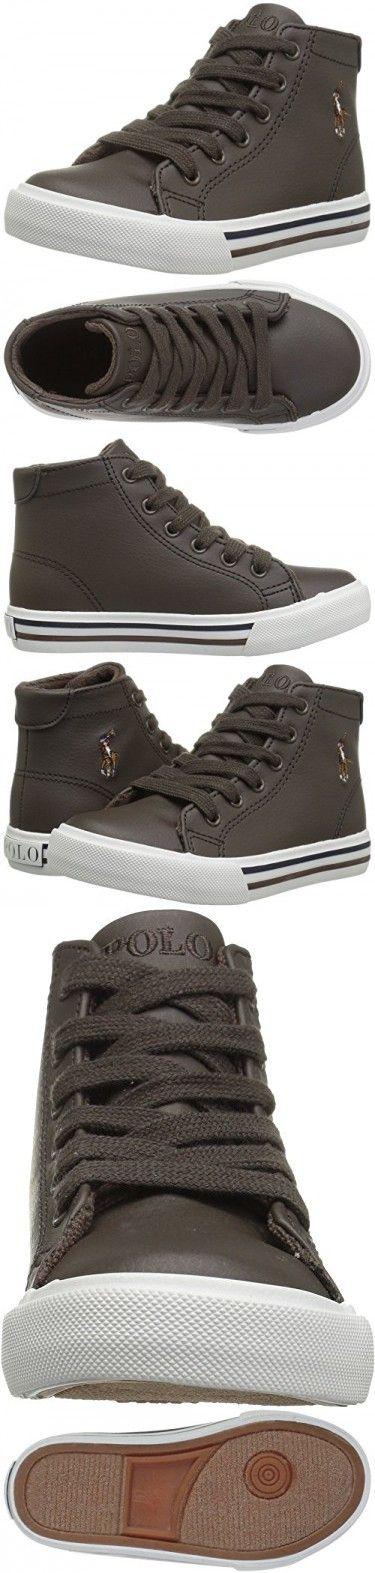 Polo Ralph Lauren Kids Boys' Slater Mid Sneaker, Chocolate Tumbled, 4.5 Medium US Toddler